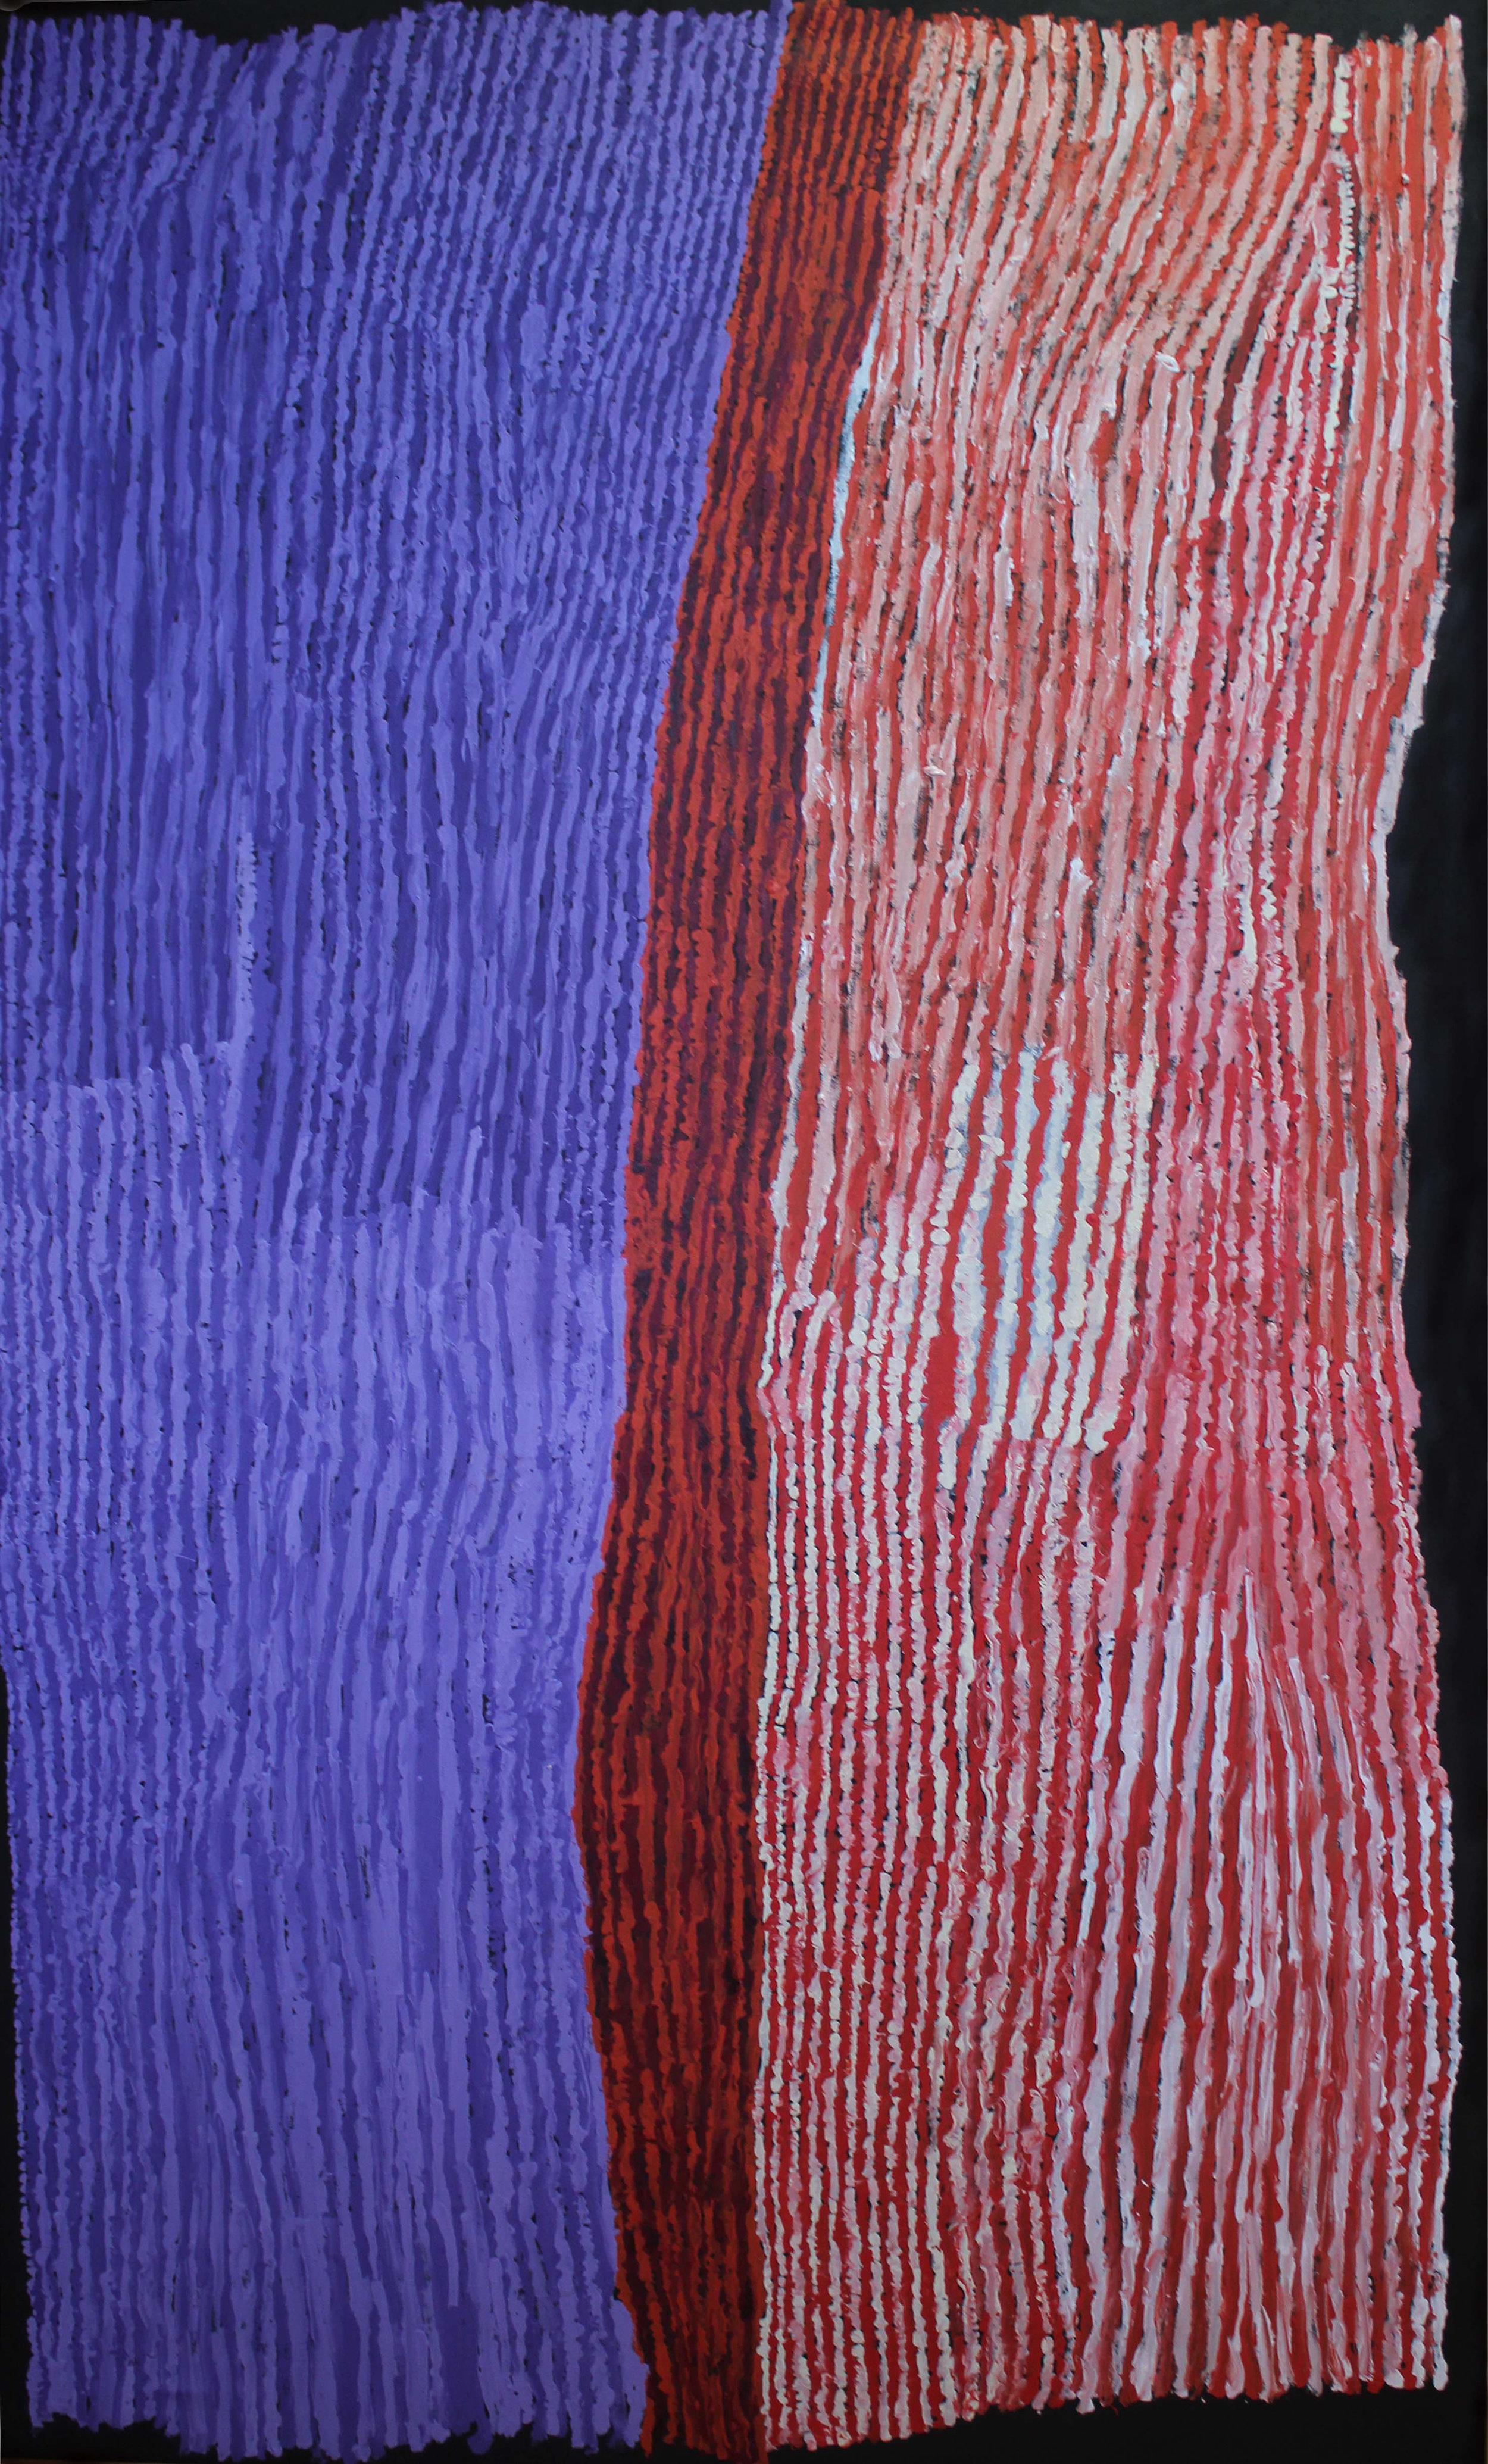 "KUNMANARA (RAY) KEN  Tali - Sand Dune  Acrylic on Belgian linen 1220 x 1980 mm (48 x 78"") Tjala Arts Catalog #394-16   EMAIL INQUIRY"